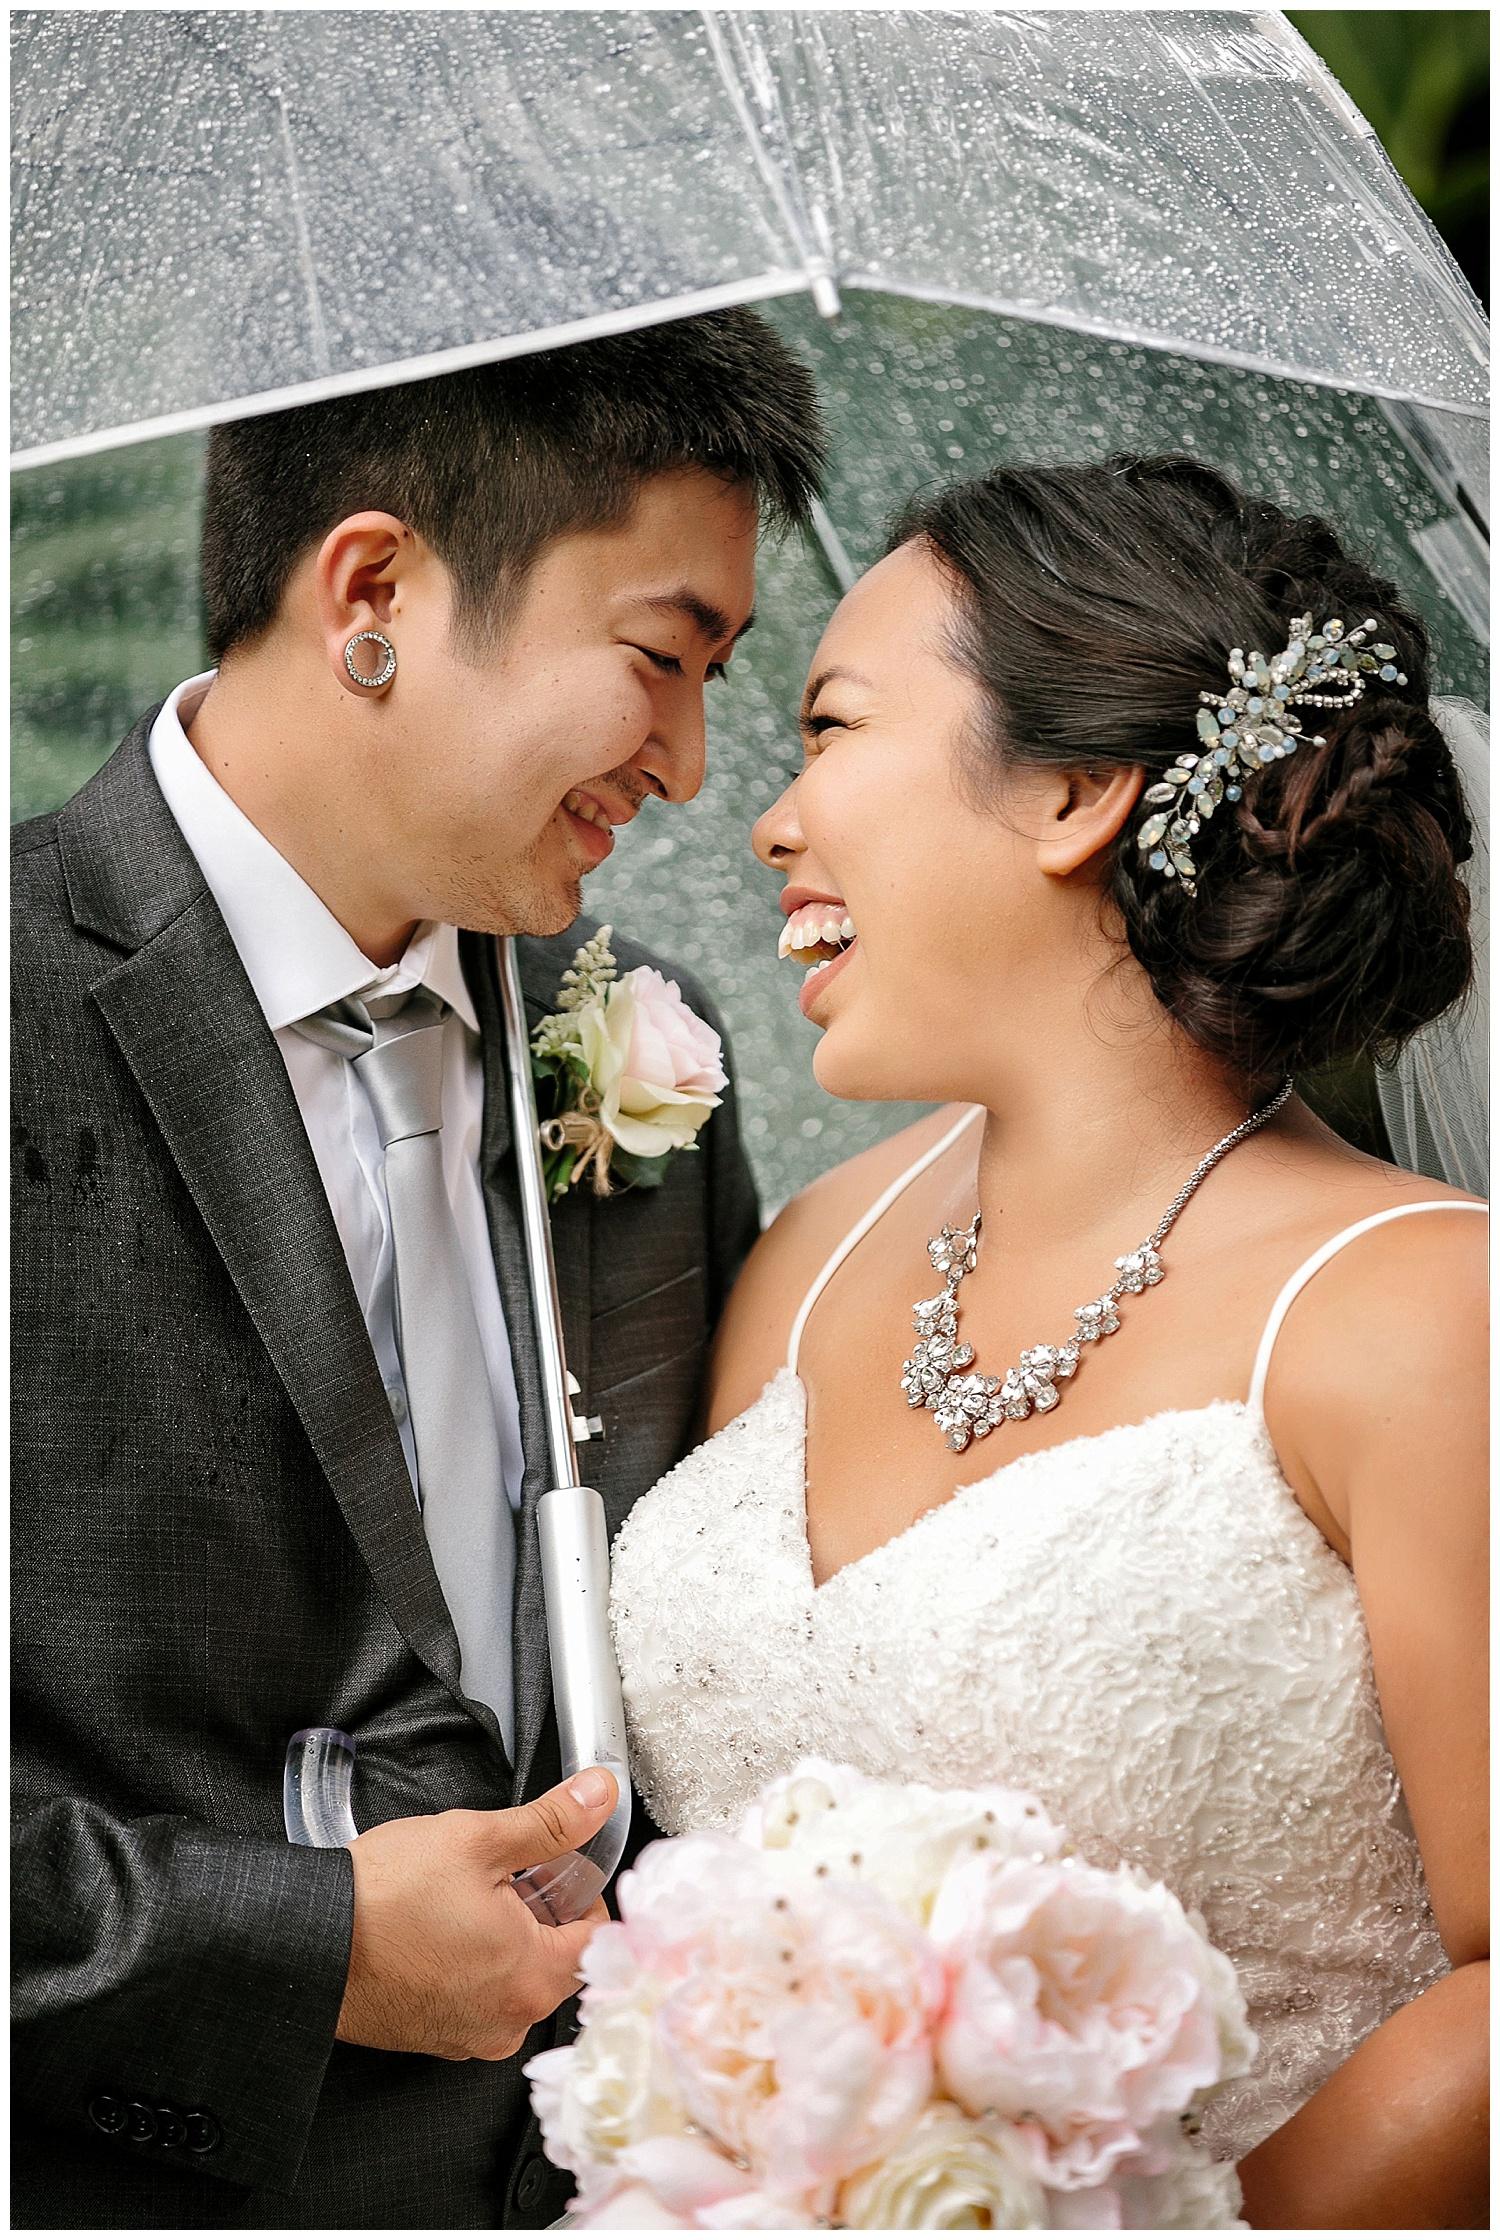 Rainy Wedding Portraits